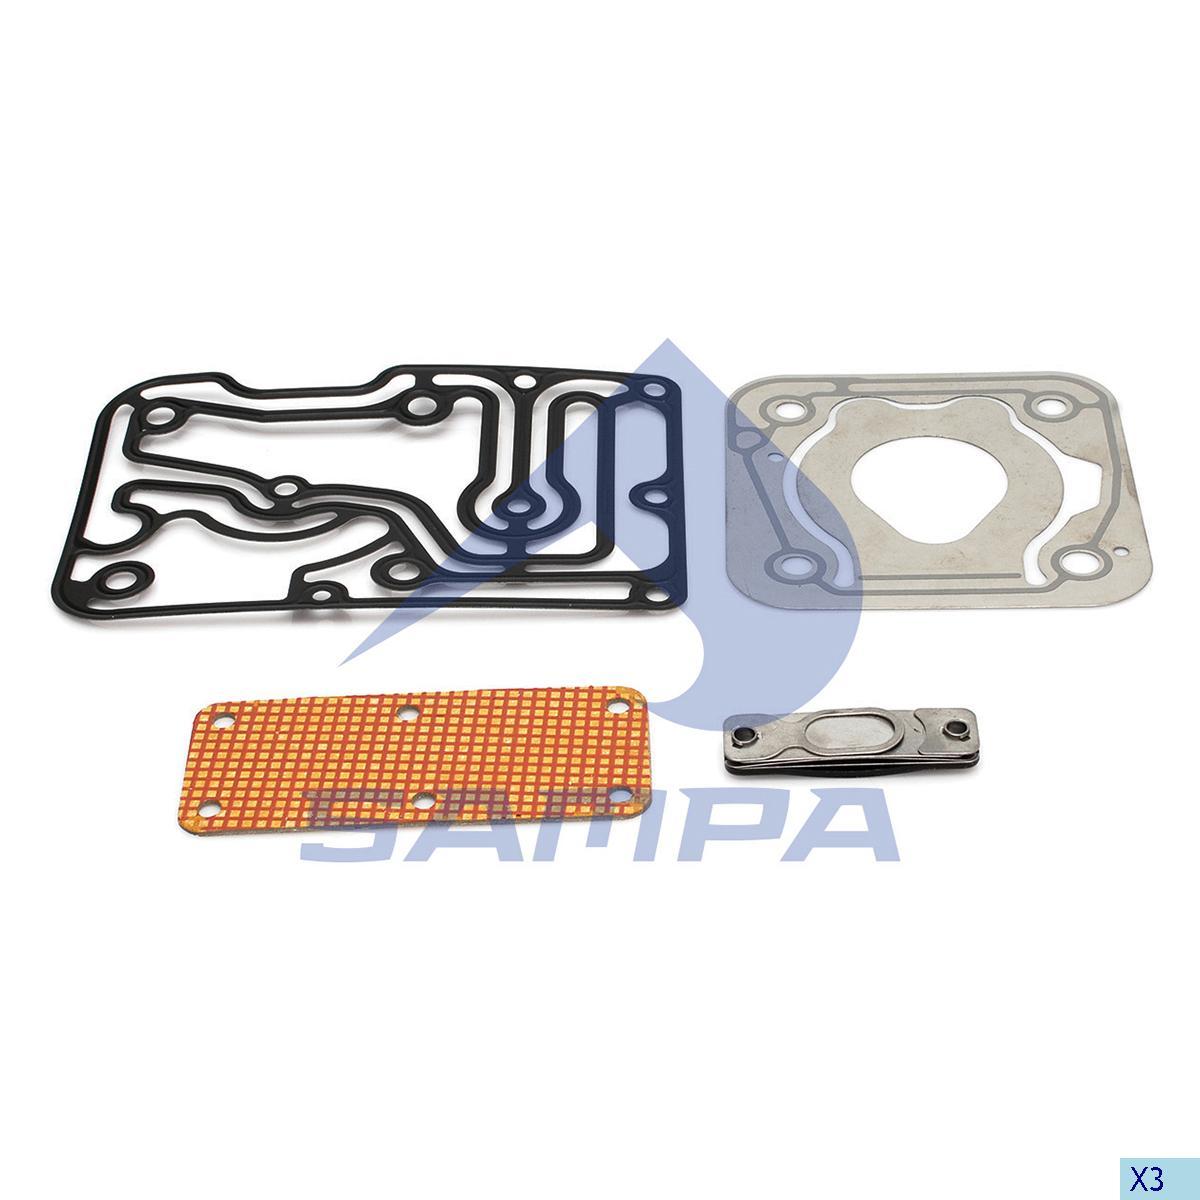 Repair Kit, Cylinder Head, Man, Compressed Air System